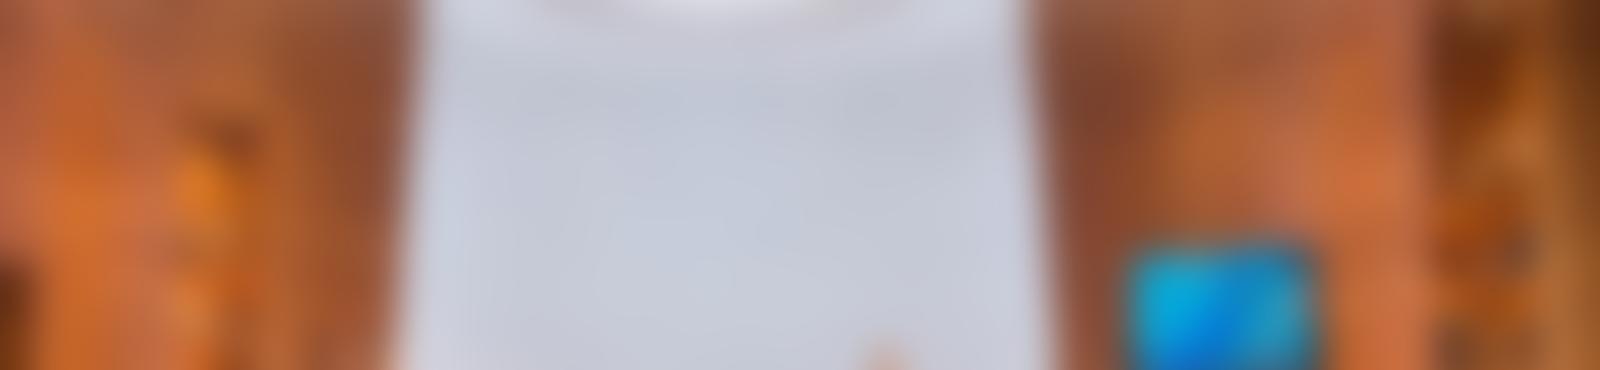 Blurred f0911555 06fc 4893 a307 3e7030af226d